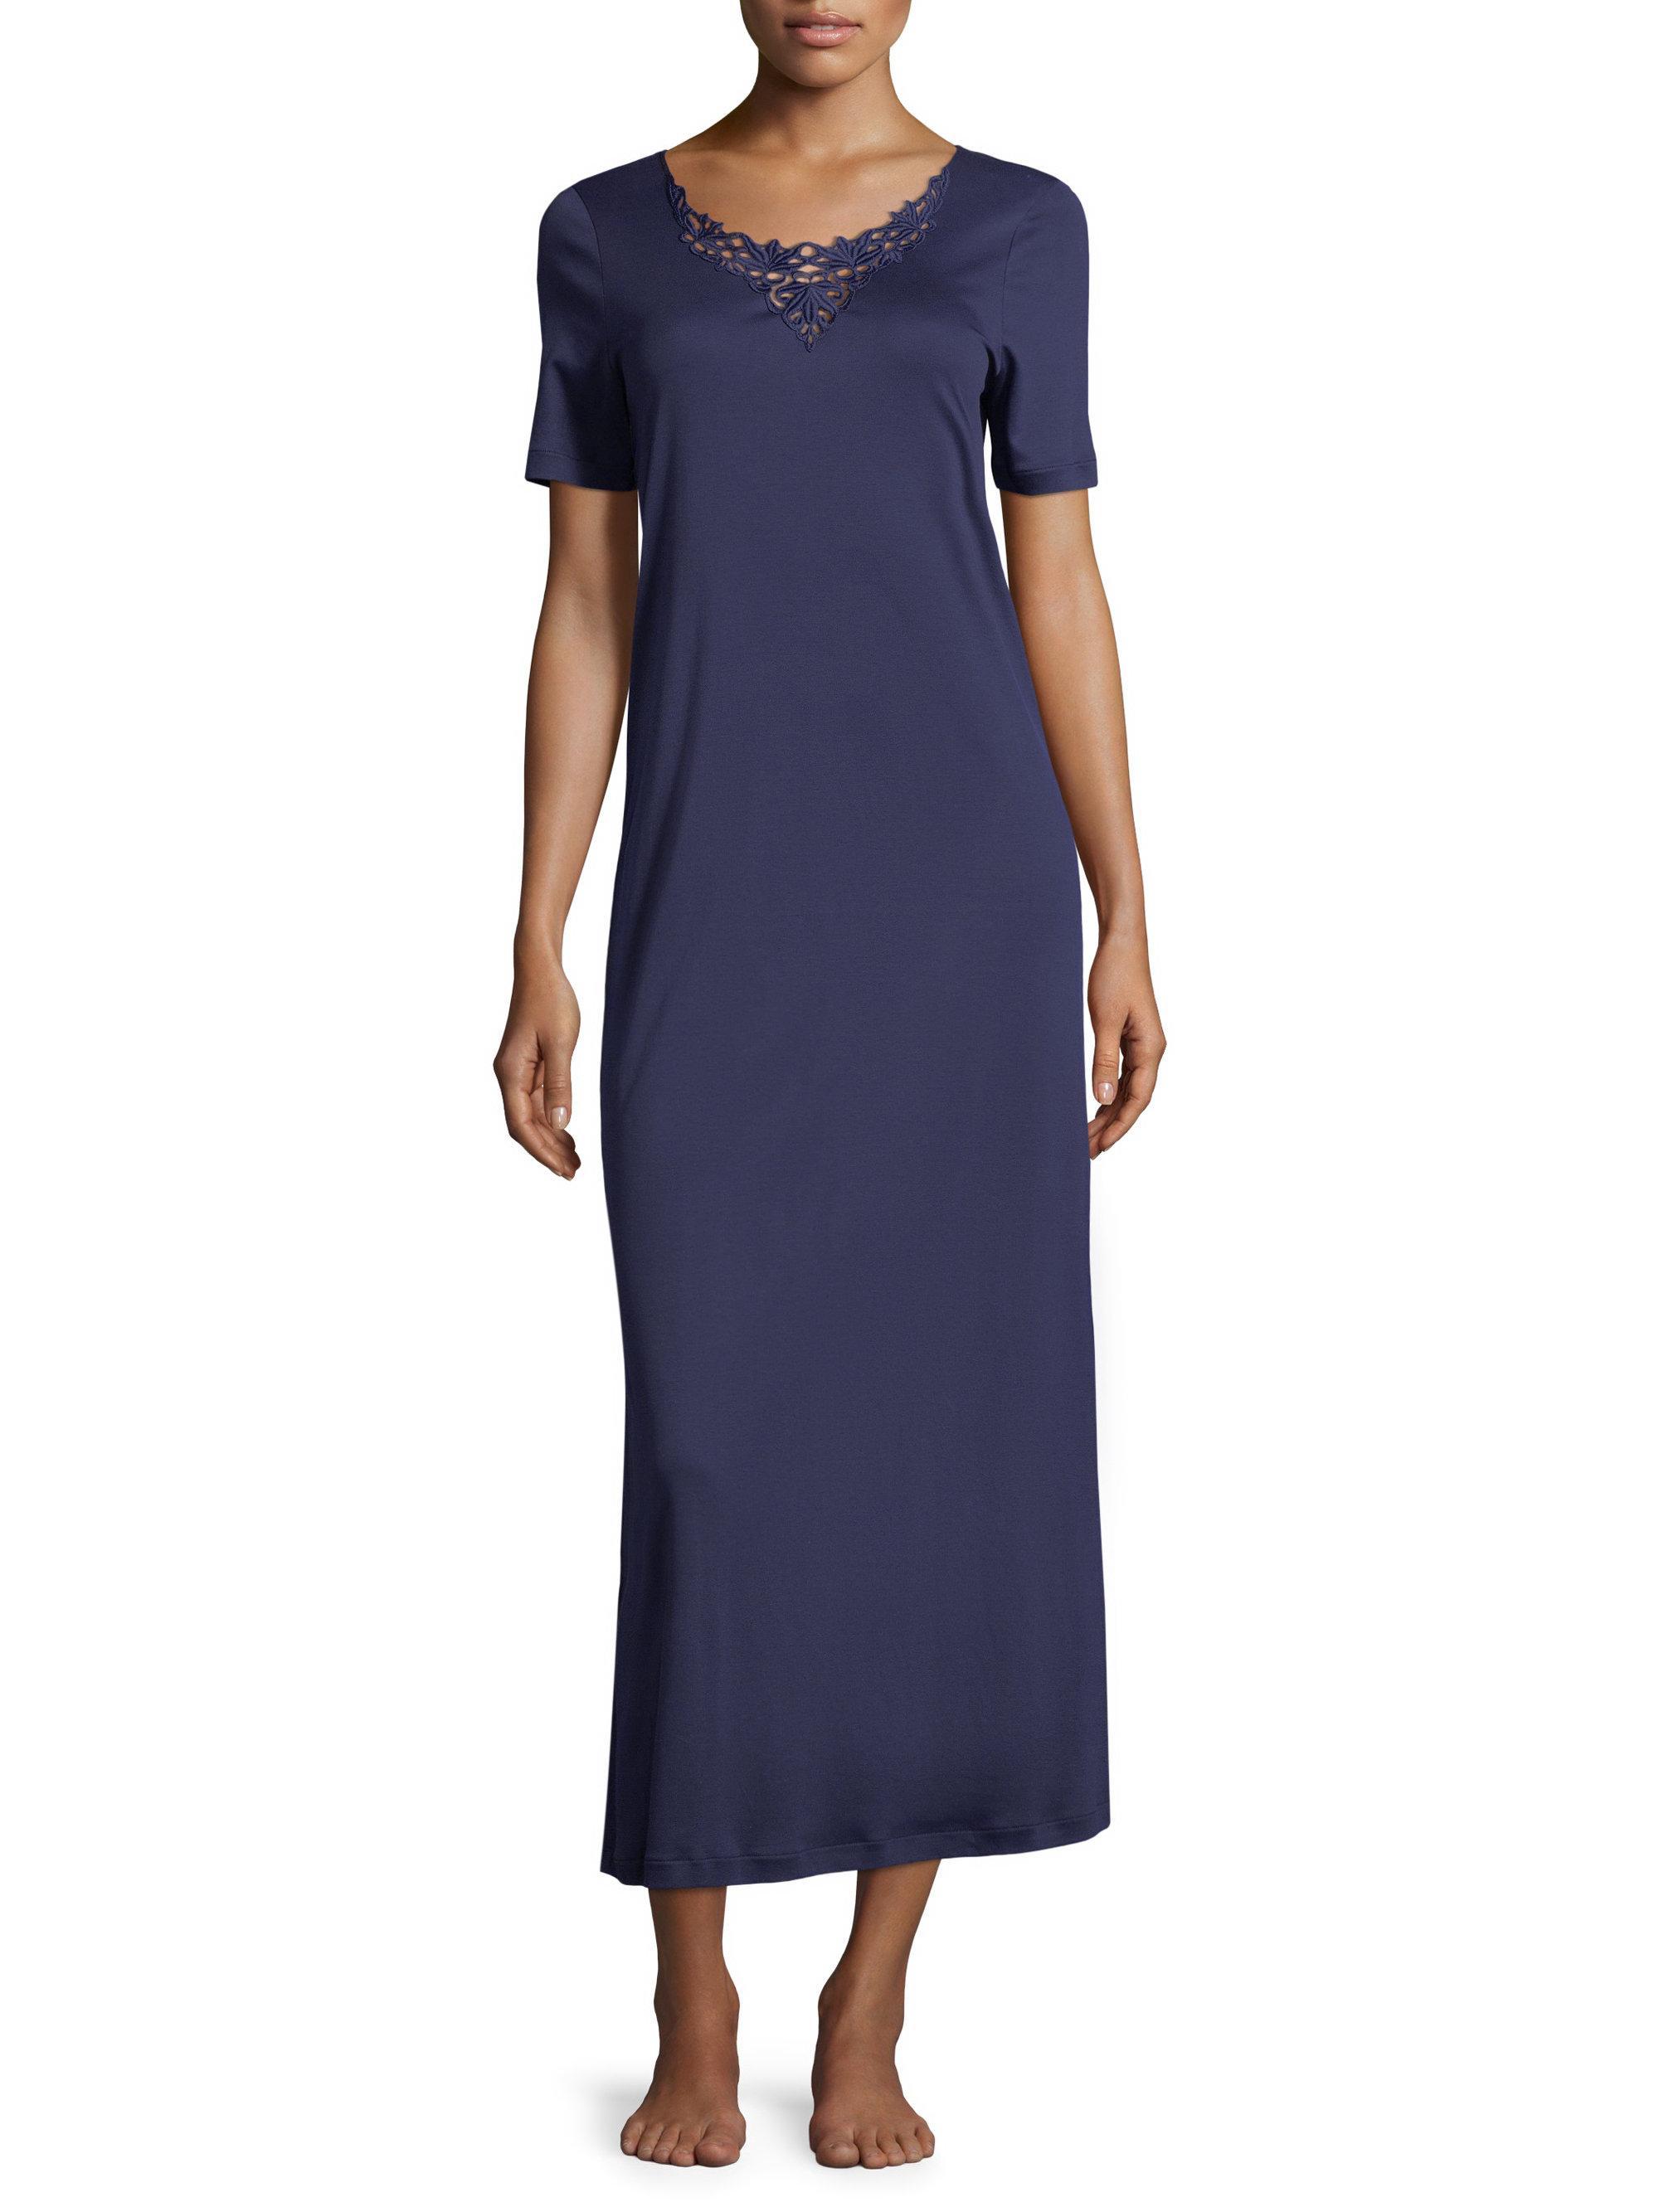 c4aa374afc Hanro Jasmin Short Sleeve Cotton Nightgown in Blue - Lyst